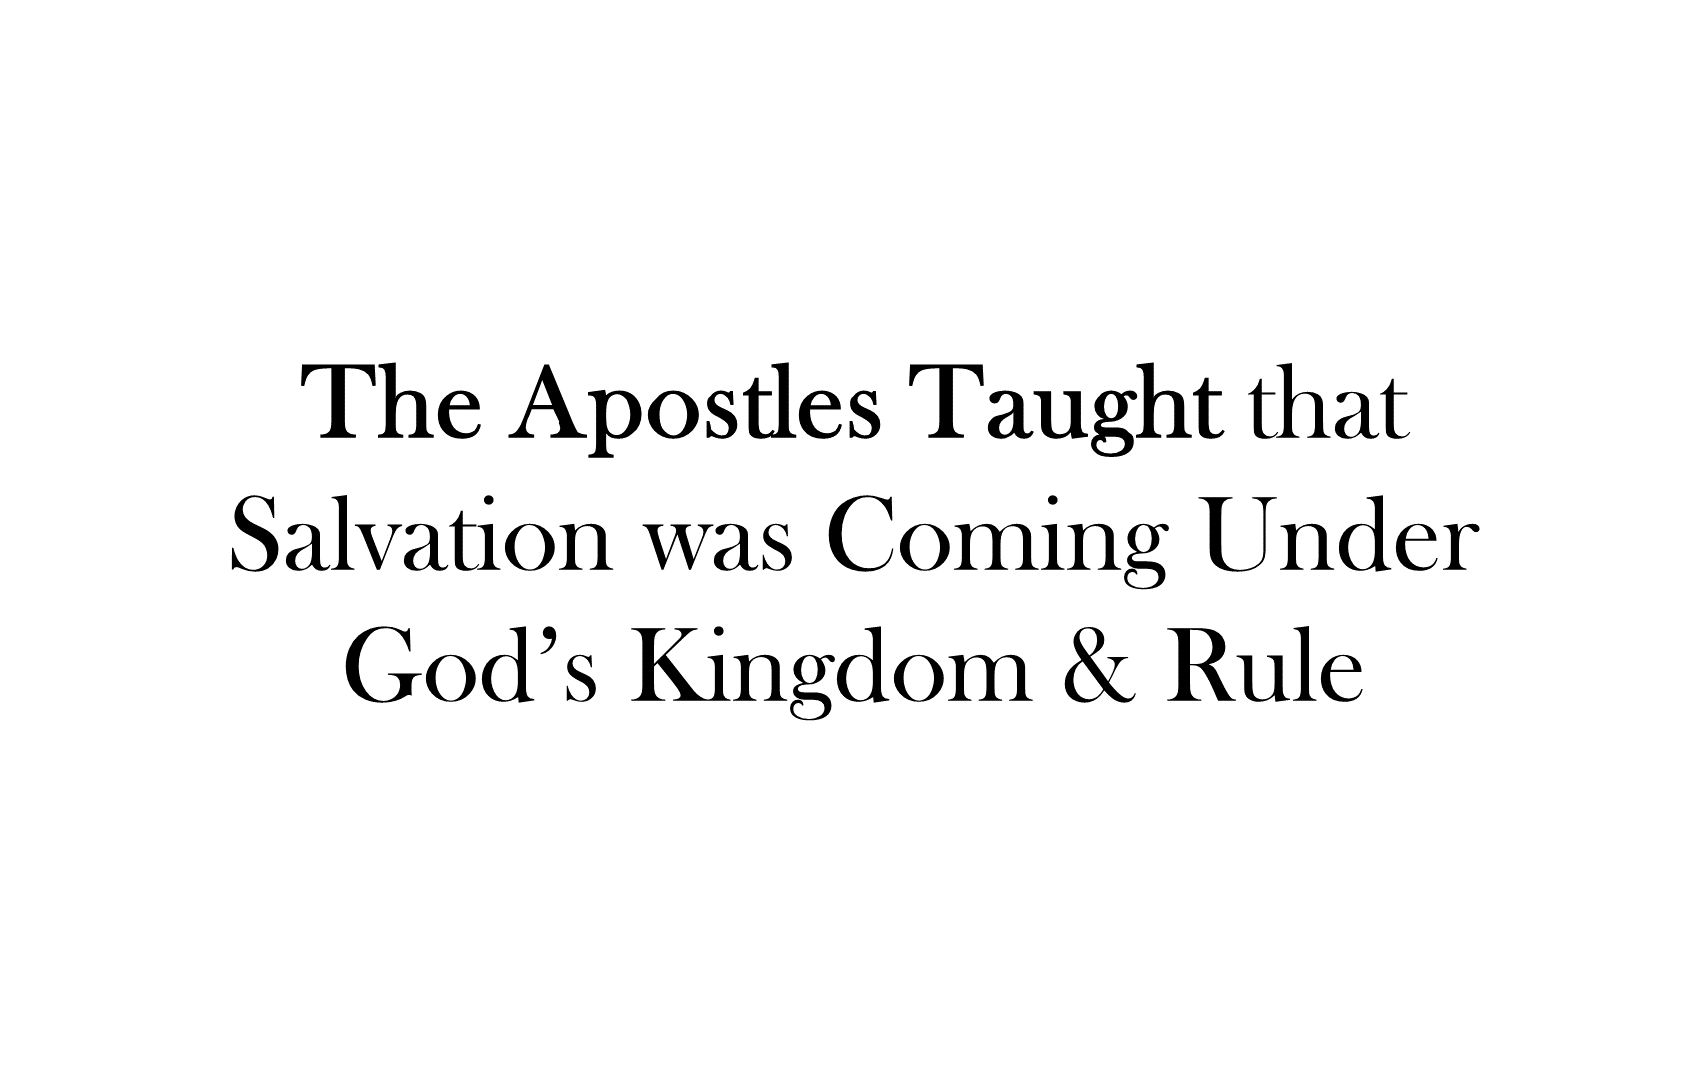 ESH-20 - The Discipline Of Disciple-Making - Seeing, Understanding, Entering, Living, & Seeking The Kingdom Of God ( (5)